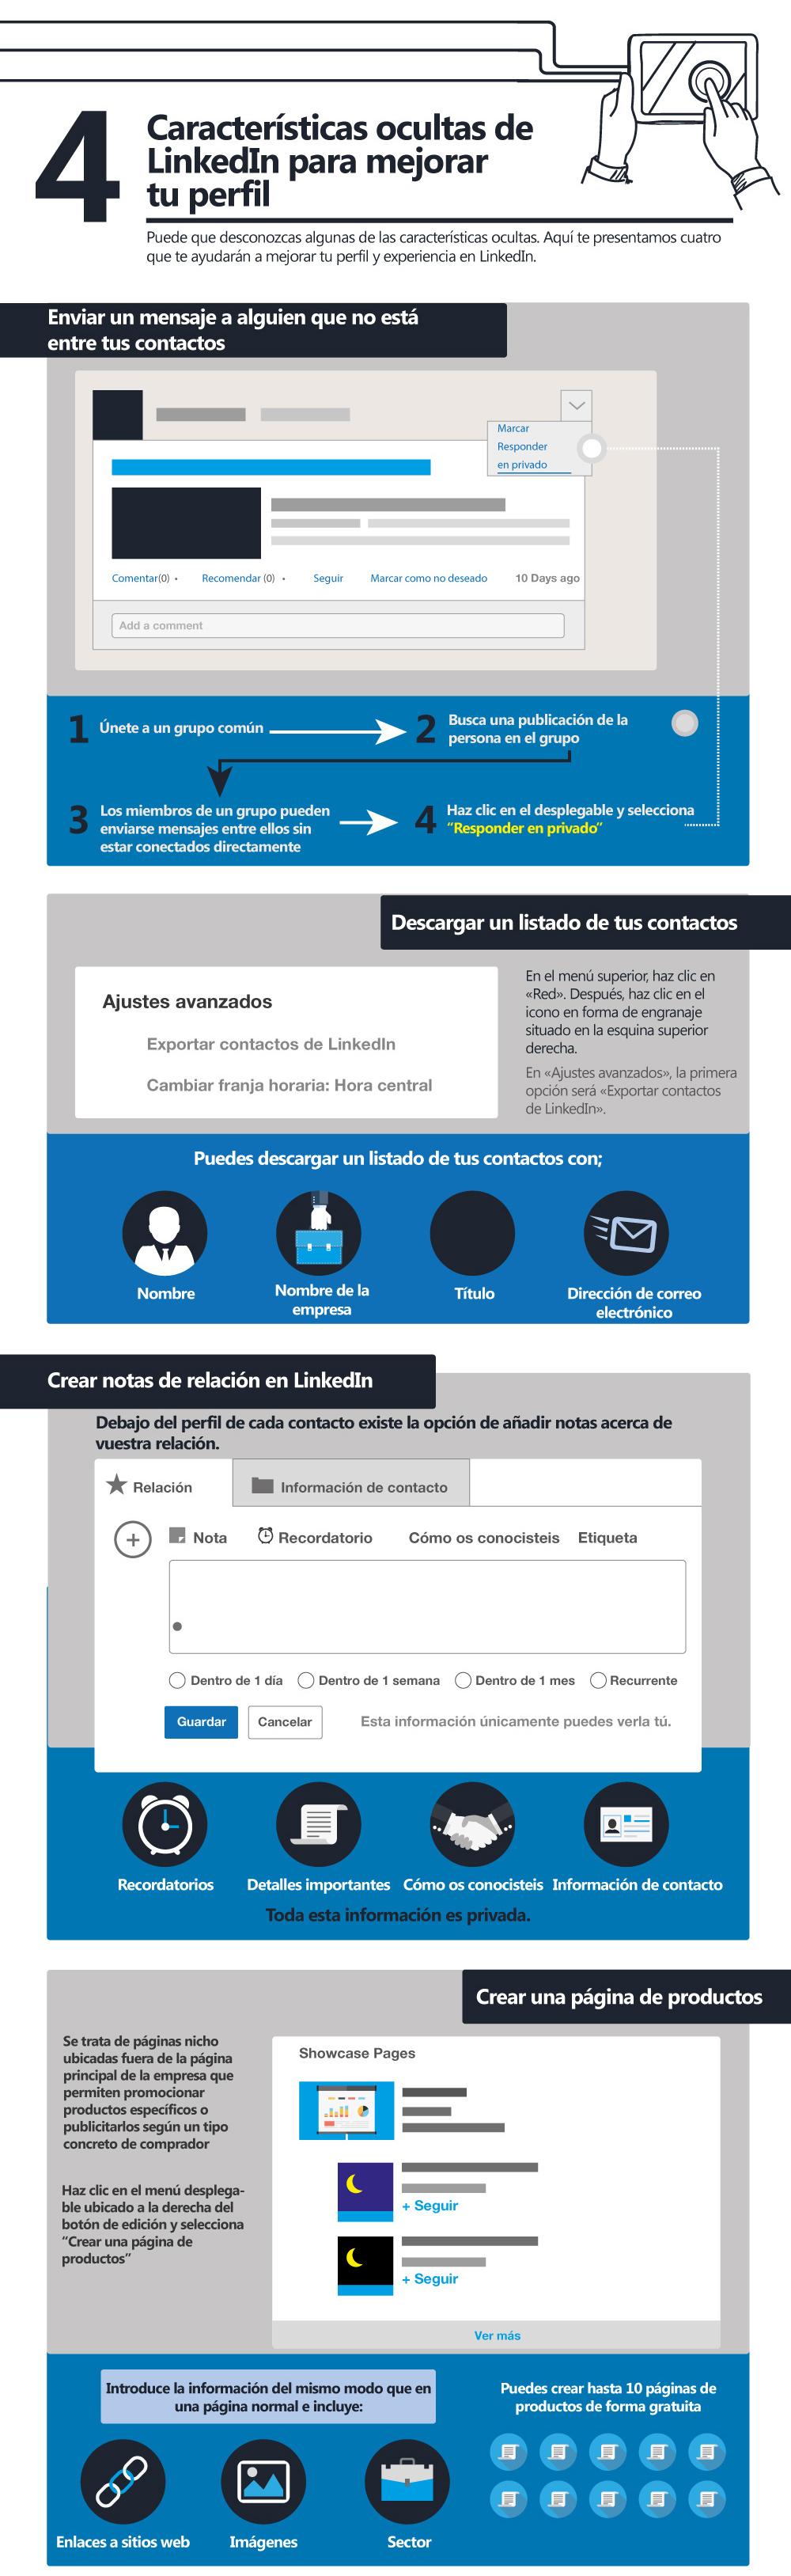 LinkedIn ES 7